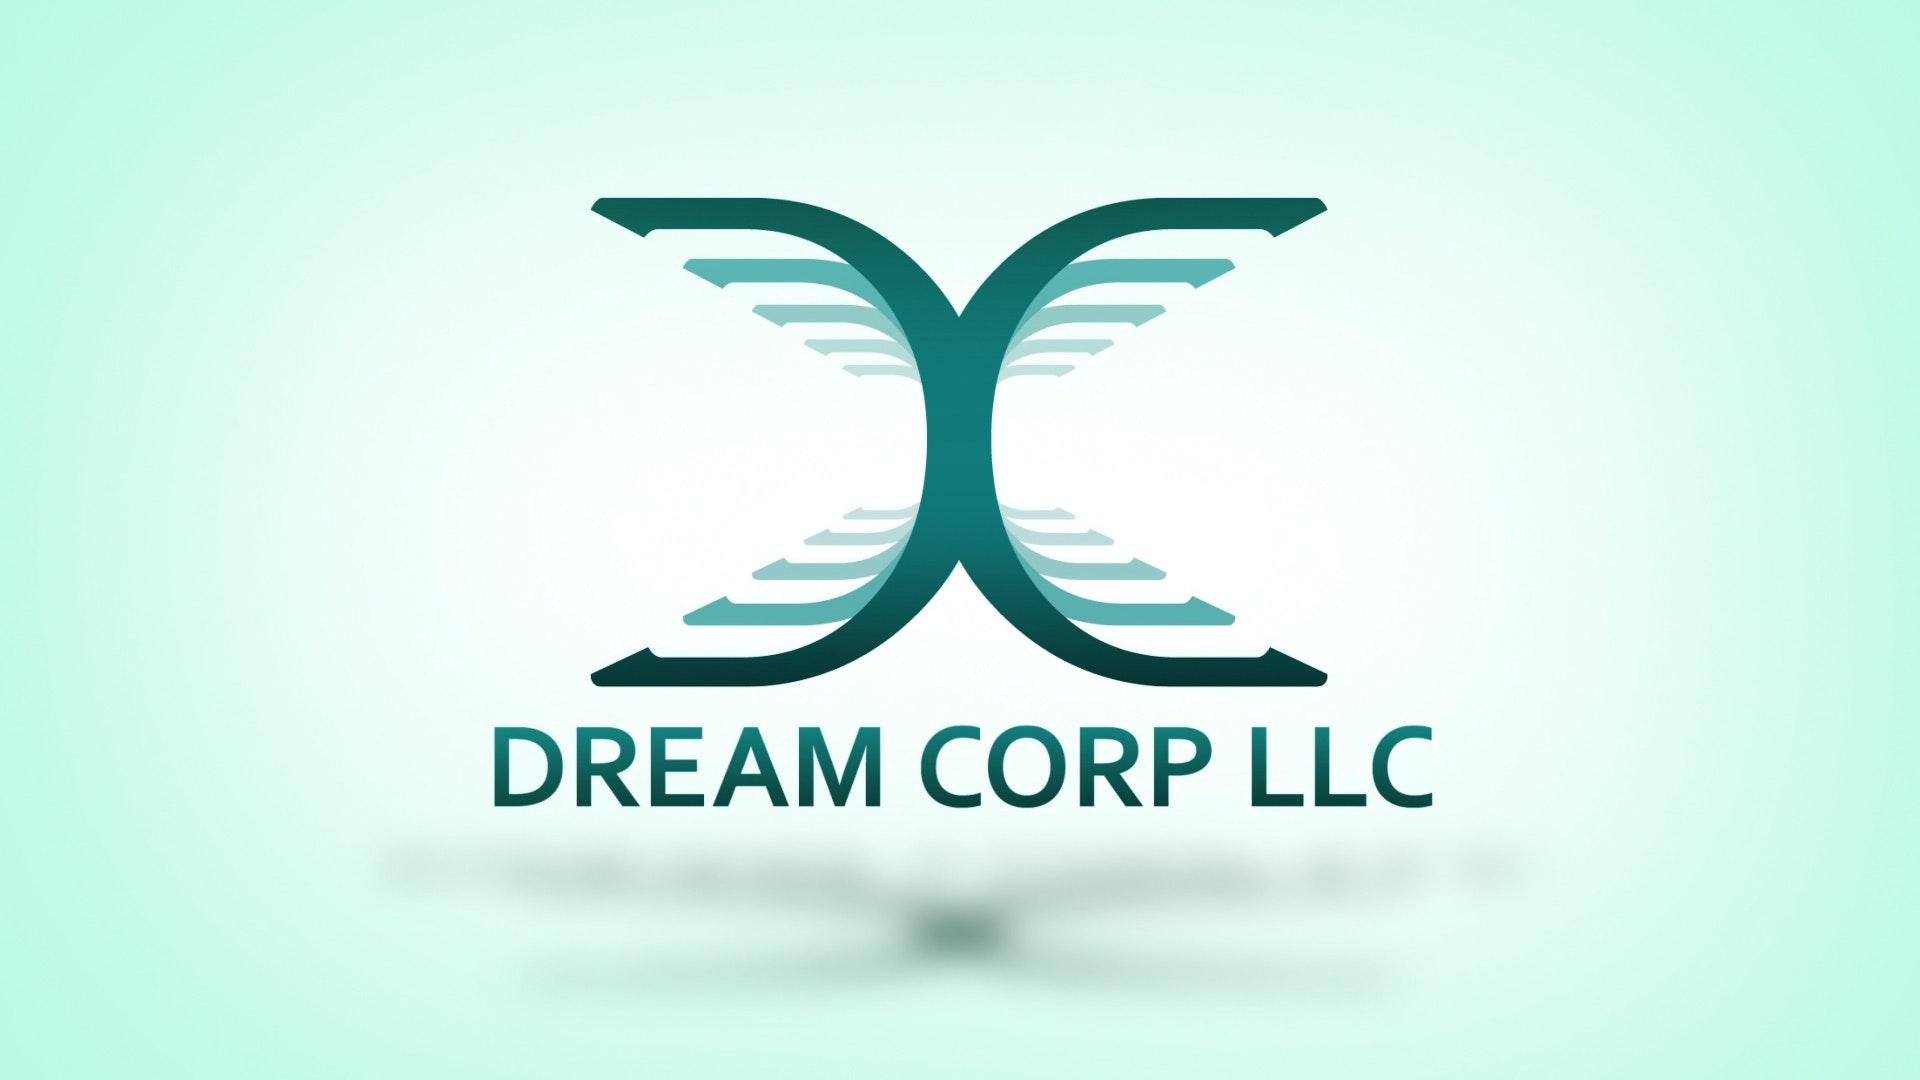 Dream Corp, LLC